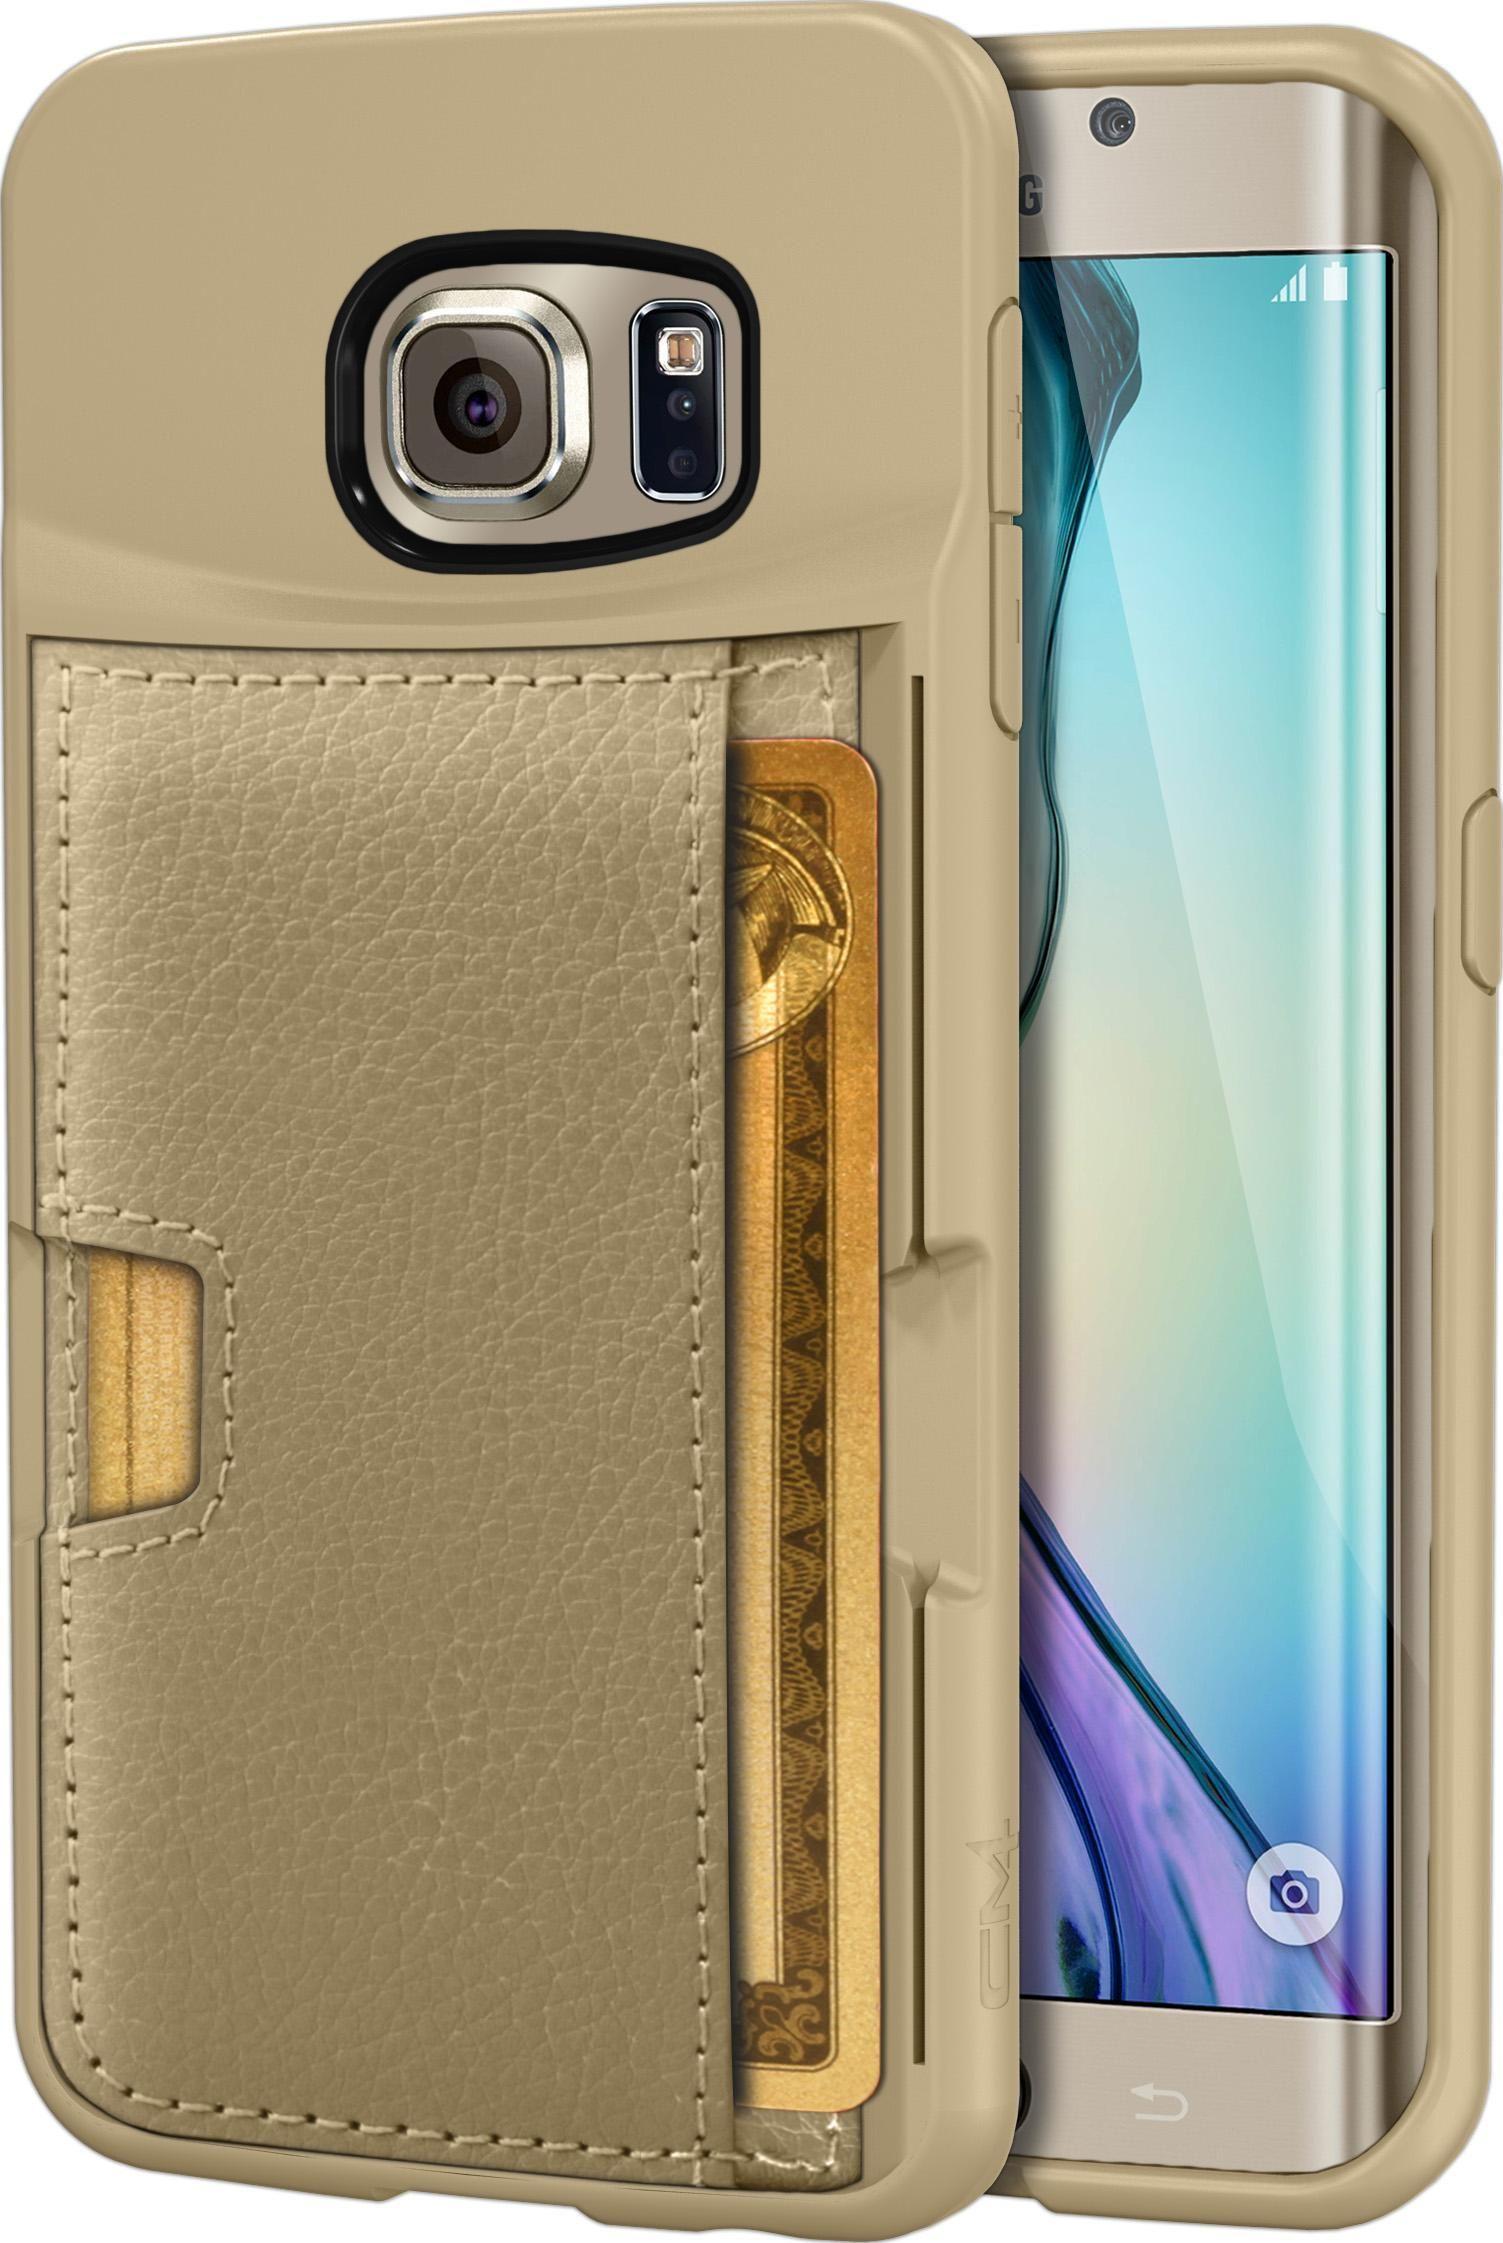 Amazon Com Galaxy S6 Edge Wallet Case Q Card Case For Samsung Galaxy S6 Edge By Cm4 Ult Samsung Galaxy S6 Edge Cases Galaxy S6 Edge Samsung Galaxy S6 Edge